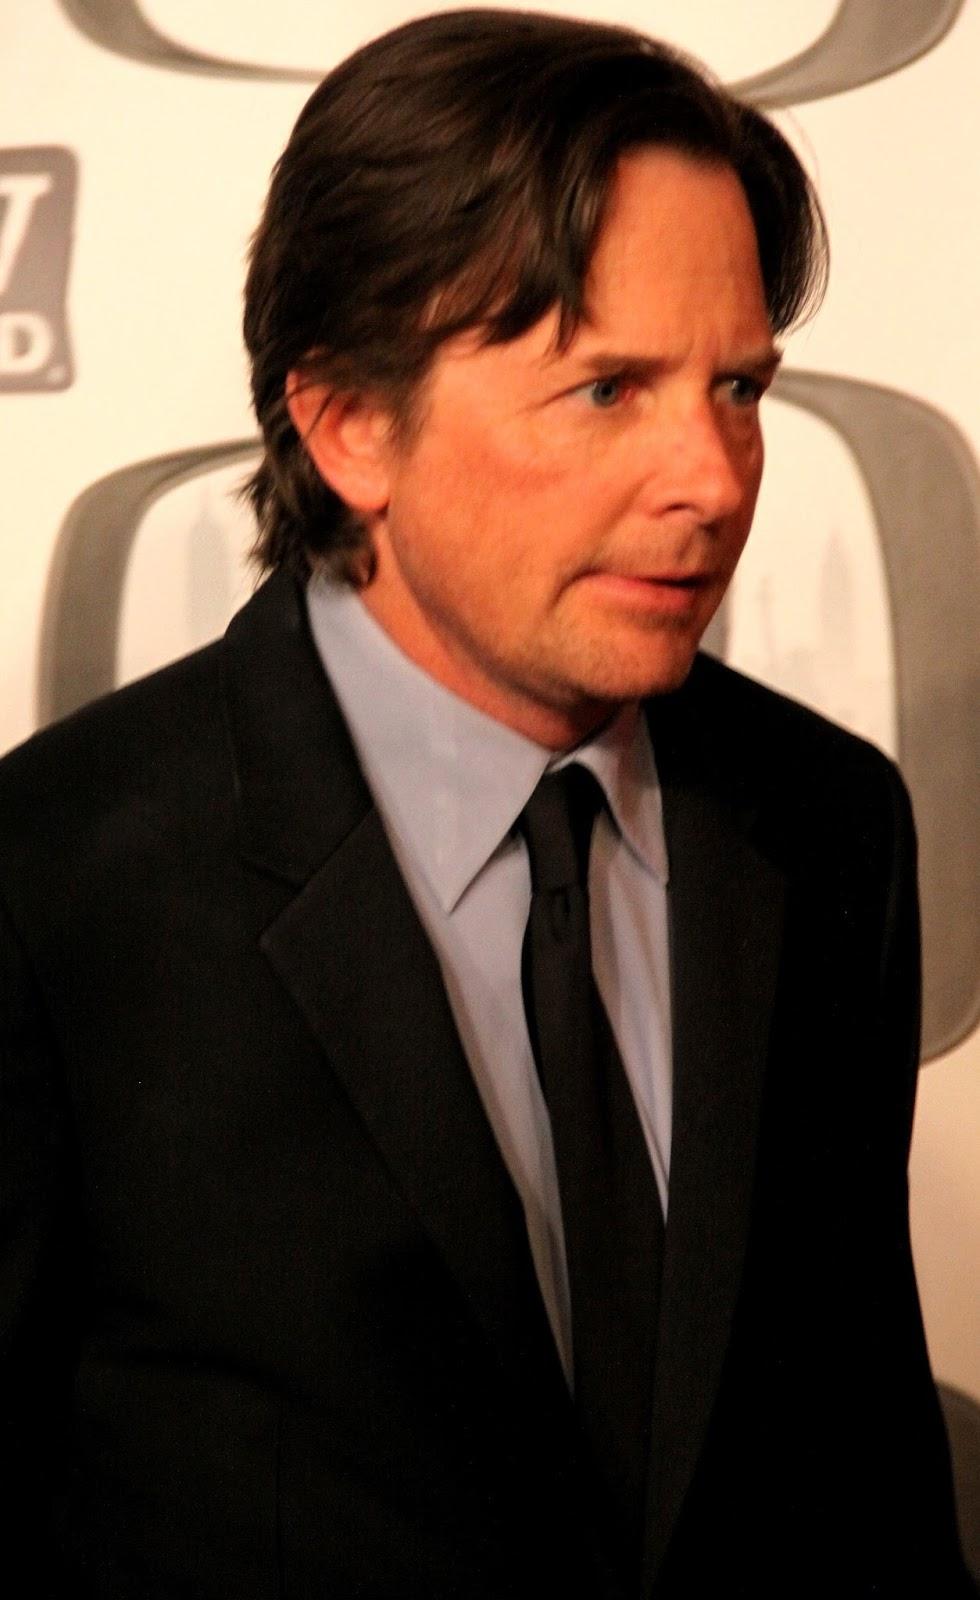 Imagenes de Michael J. Fox